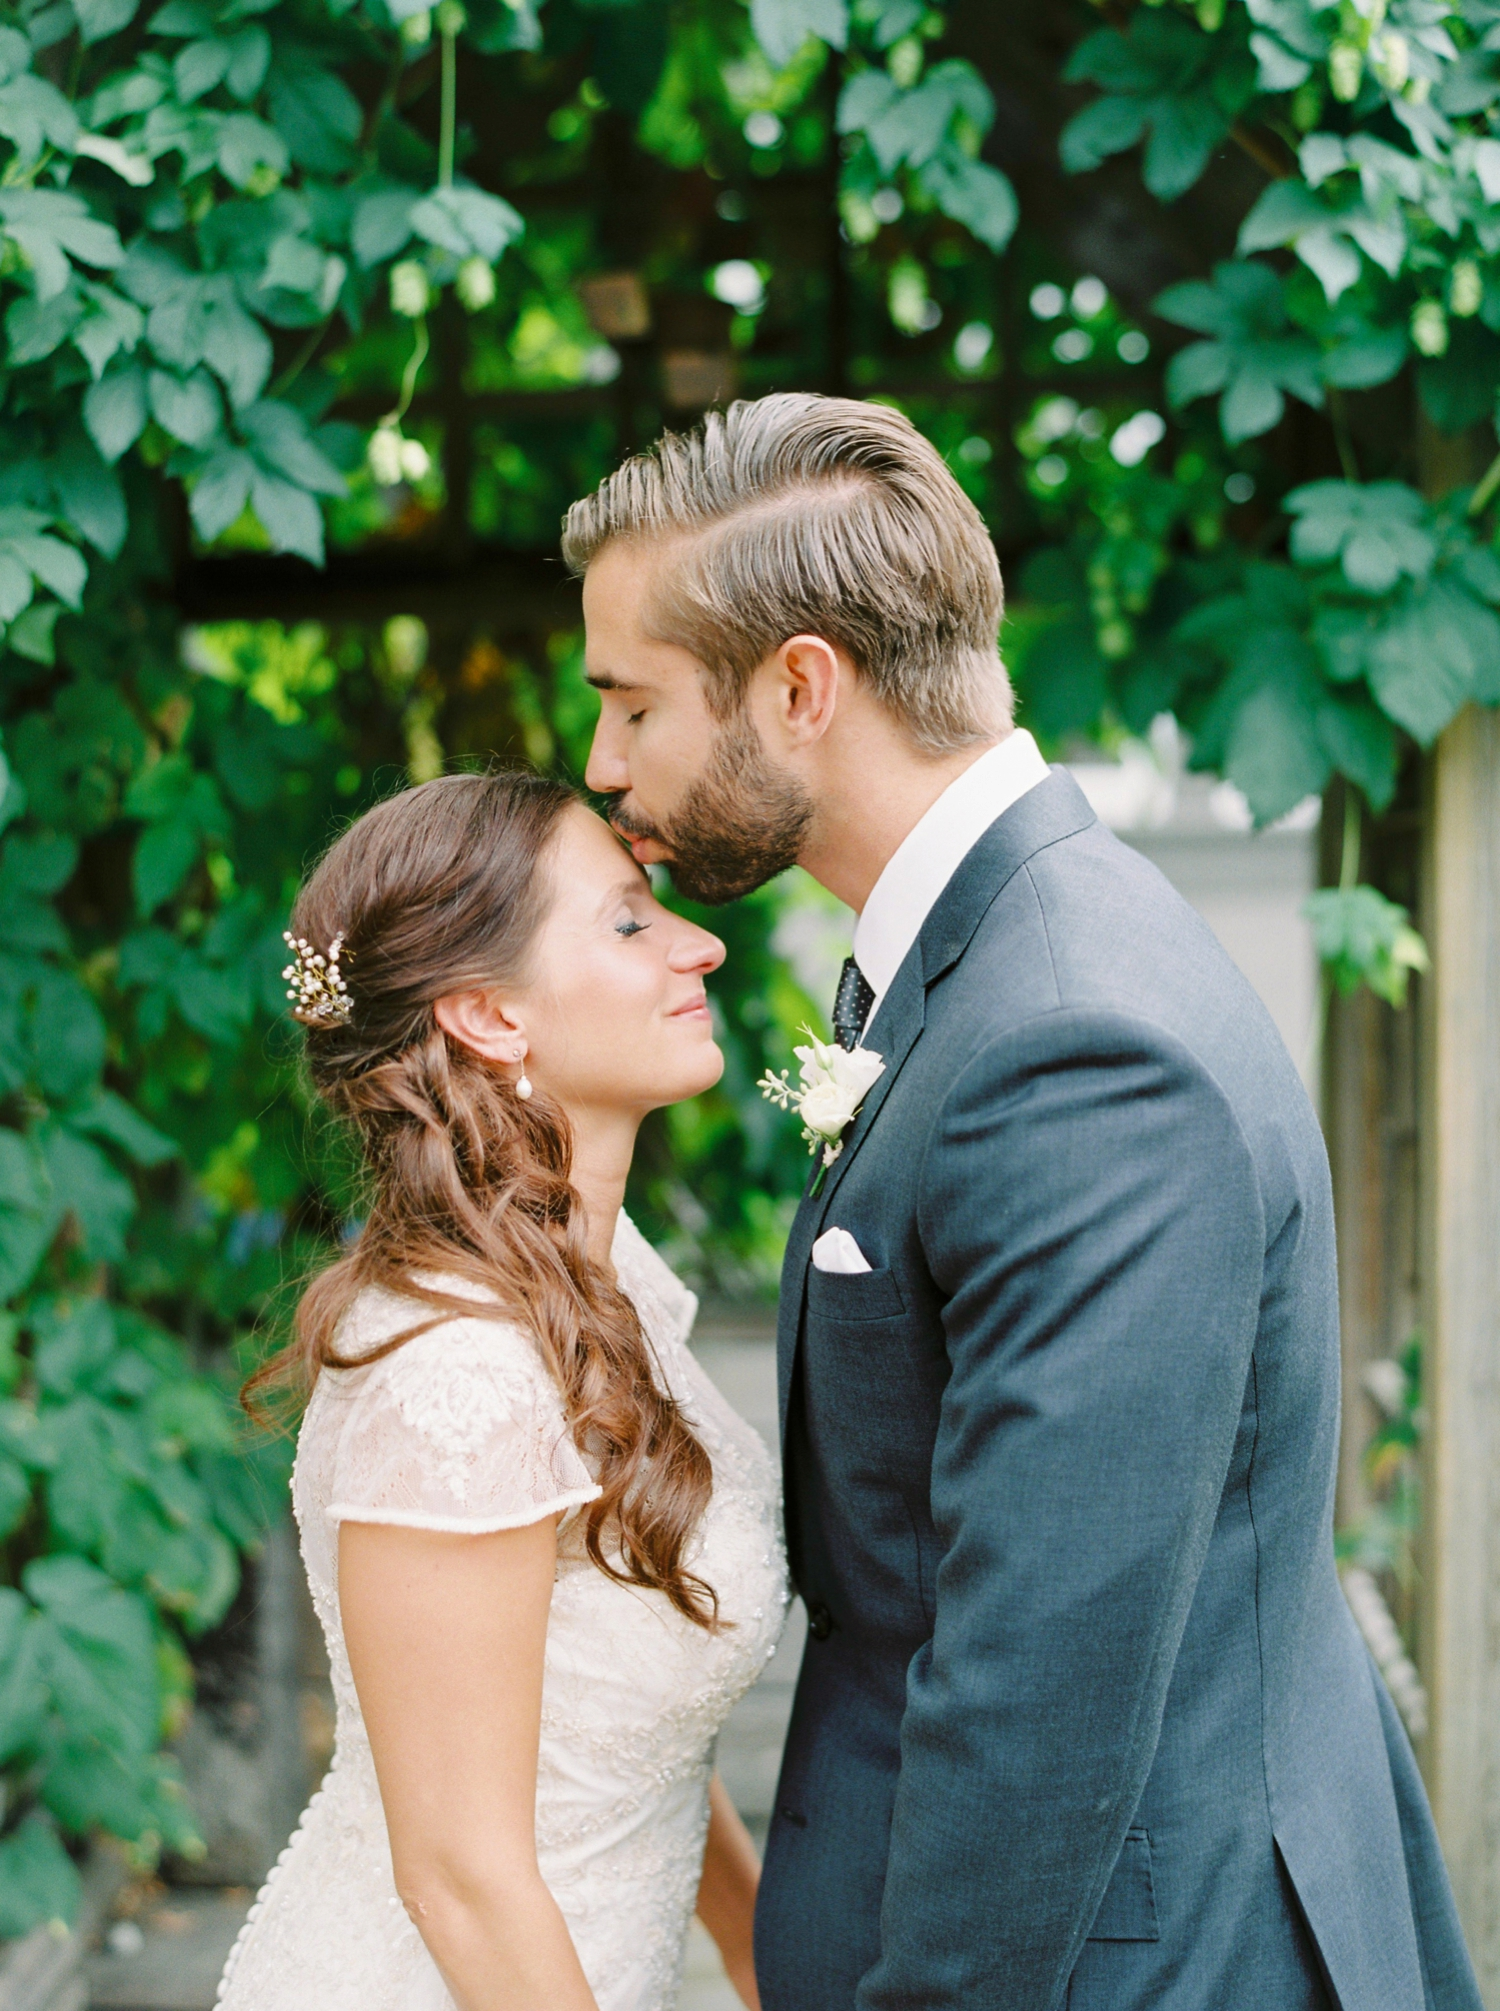 Calgary wedding photographers | fine art film | Justine Milton Photography | wedding inspiration | wedding dress | bride and groom portraits | couple kissing